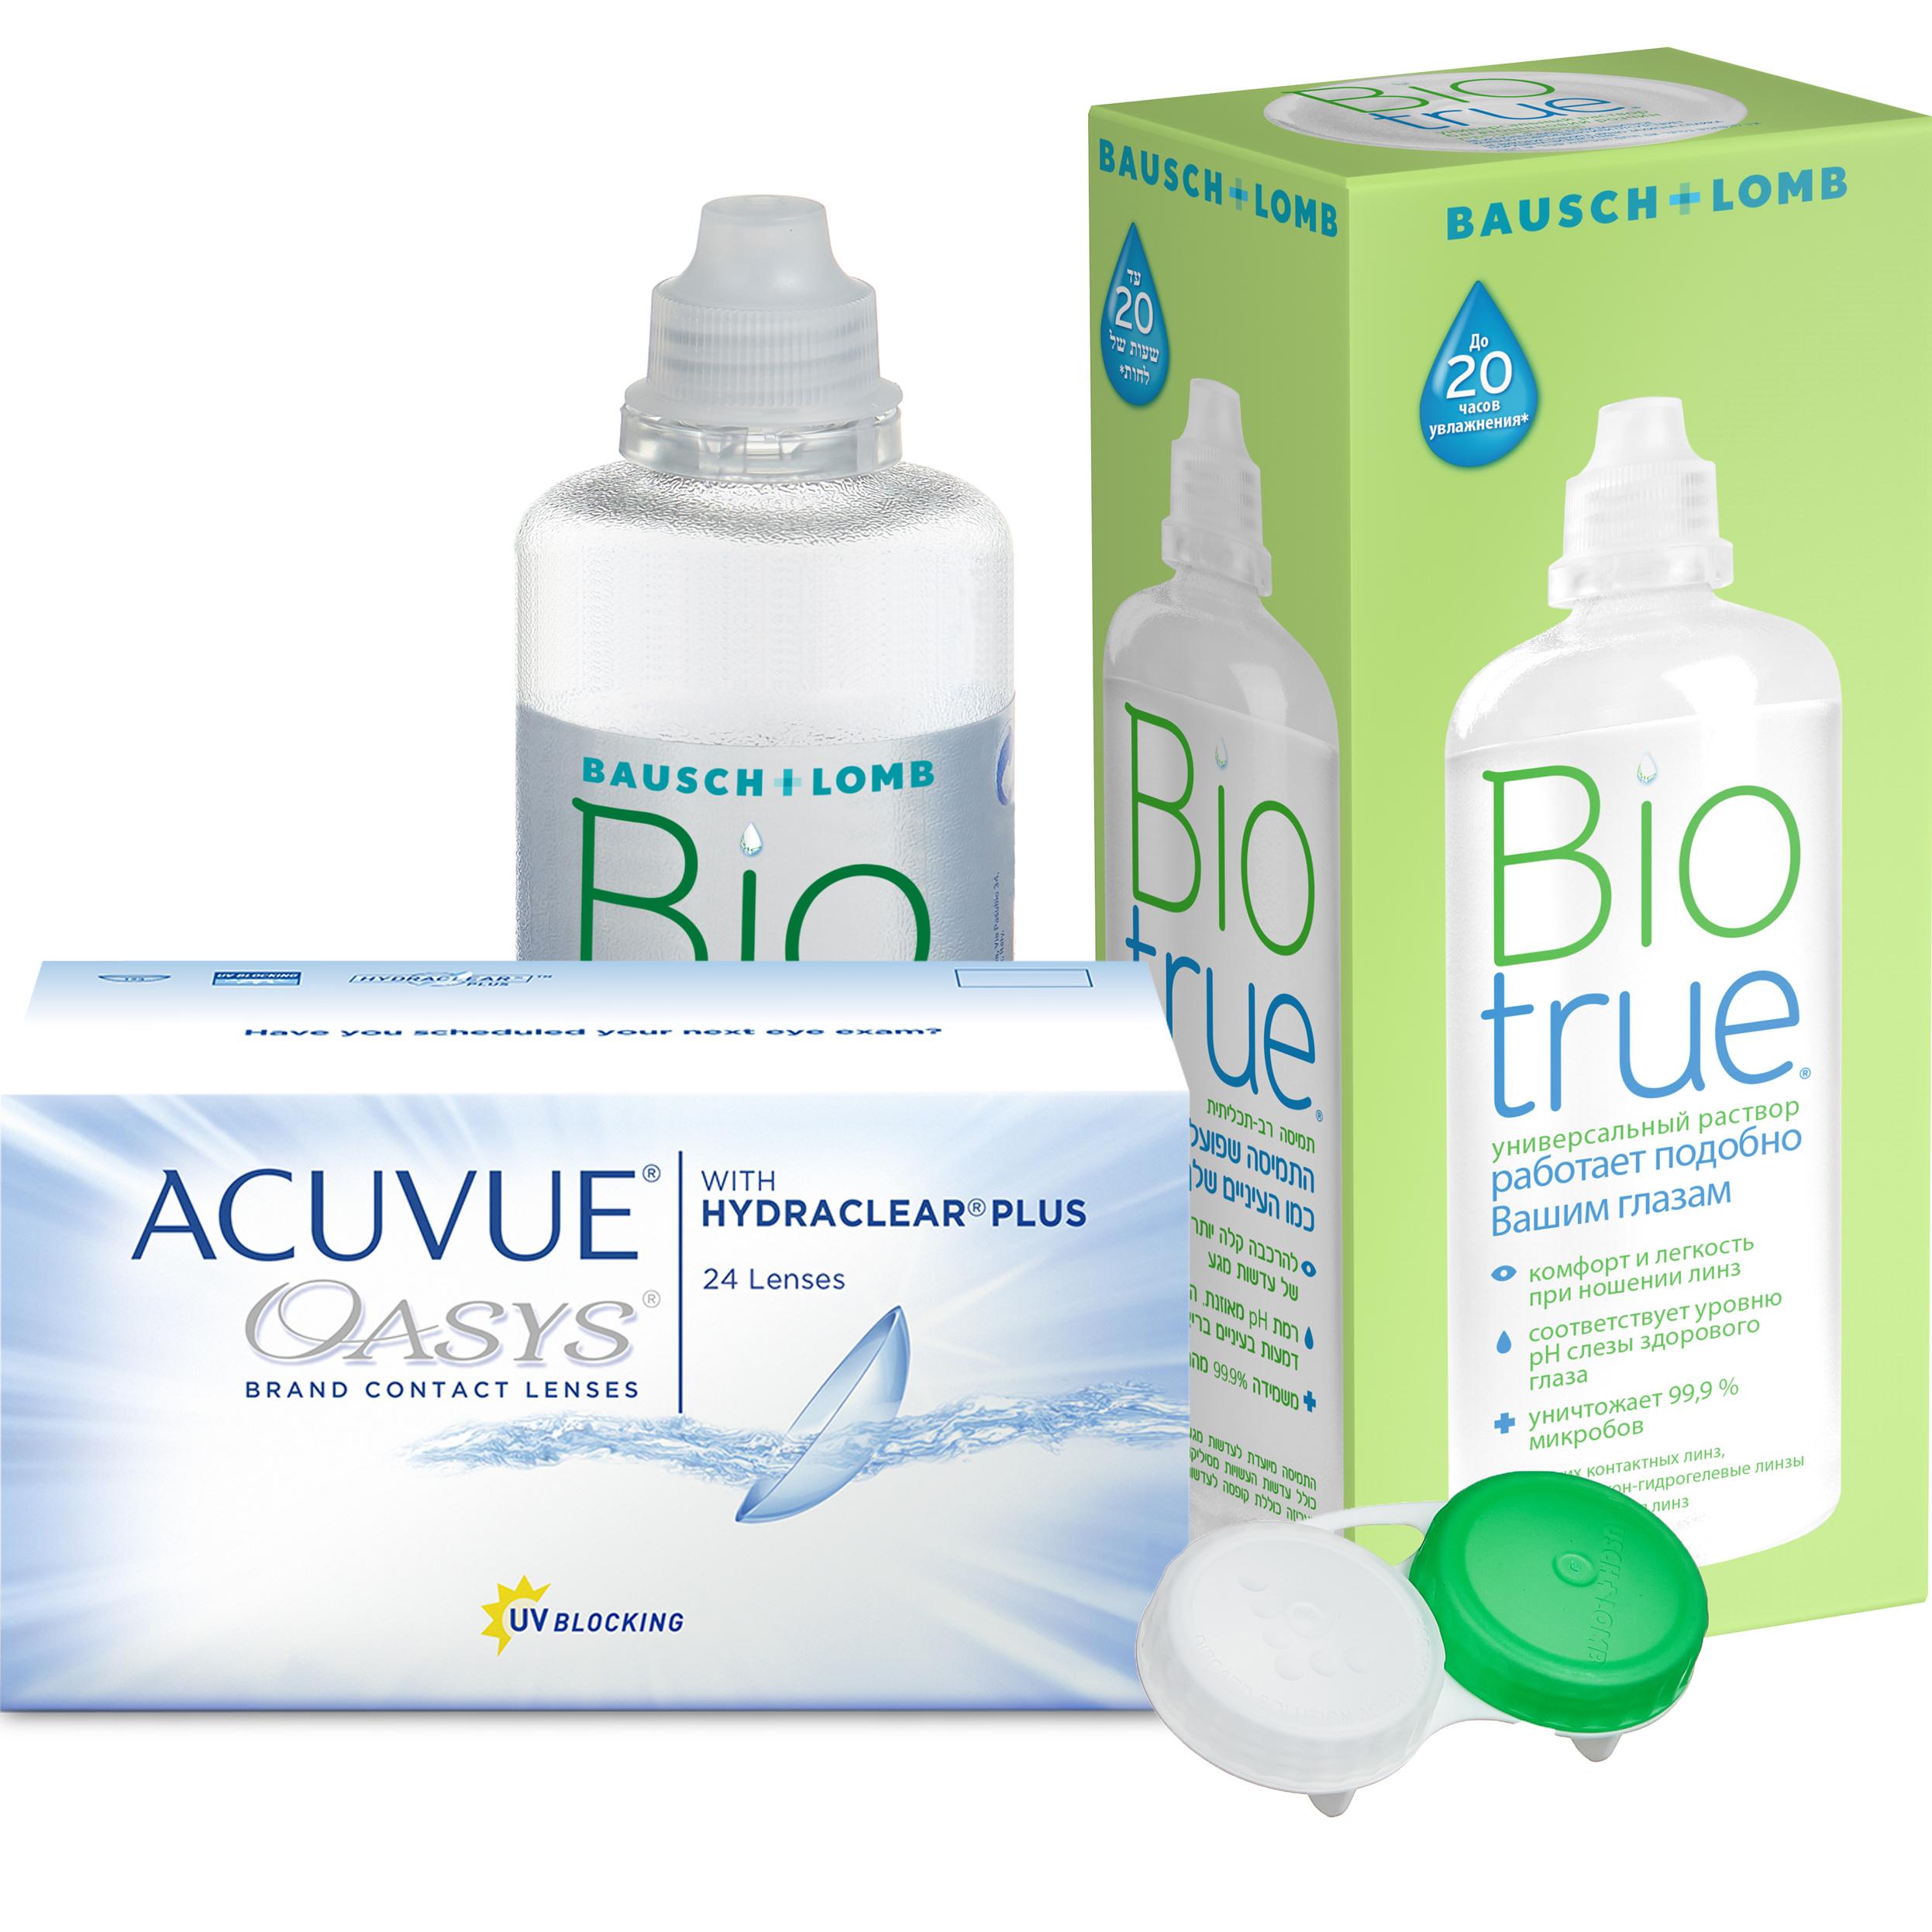 Купить Oasys with Hydraclear Plus 24 линзы + Biotrue, Контактные линзы Acuvue Oasys with Hydraclear Plus 24 линзы R 8.8 -1, 75 + Biotrue 300 мл